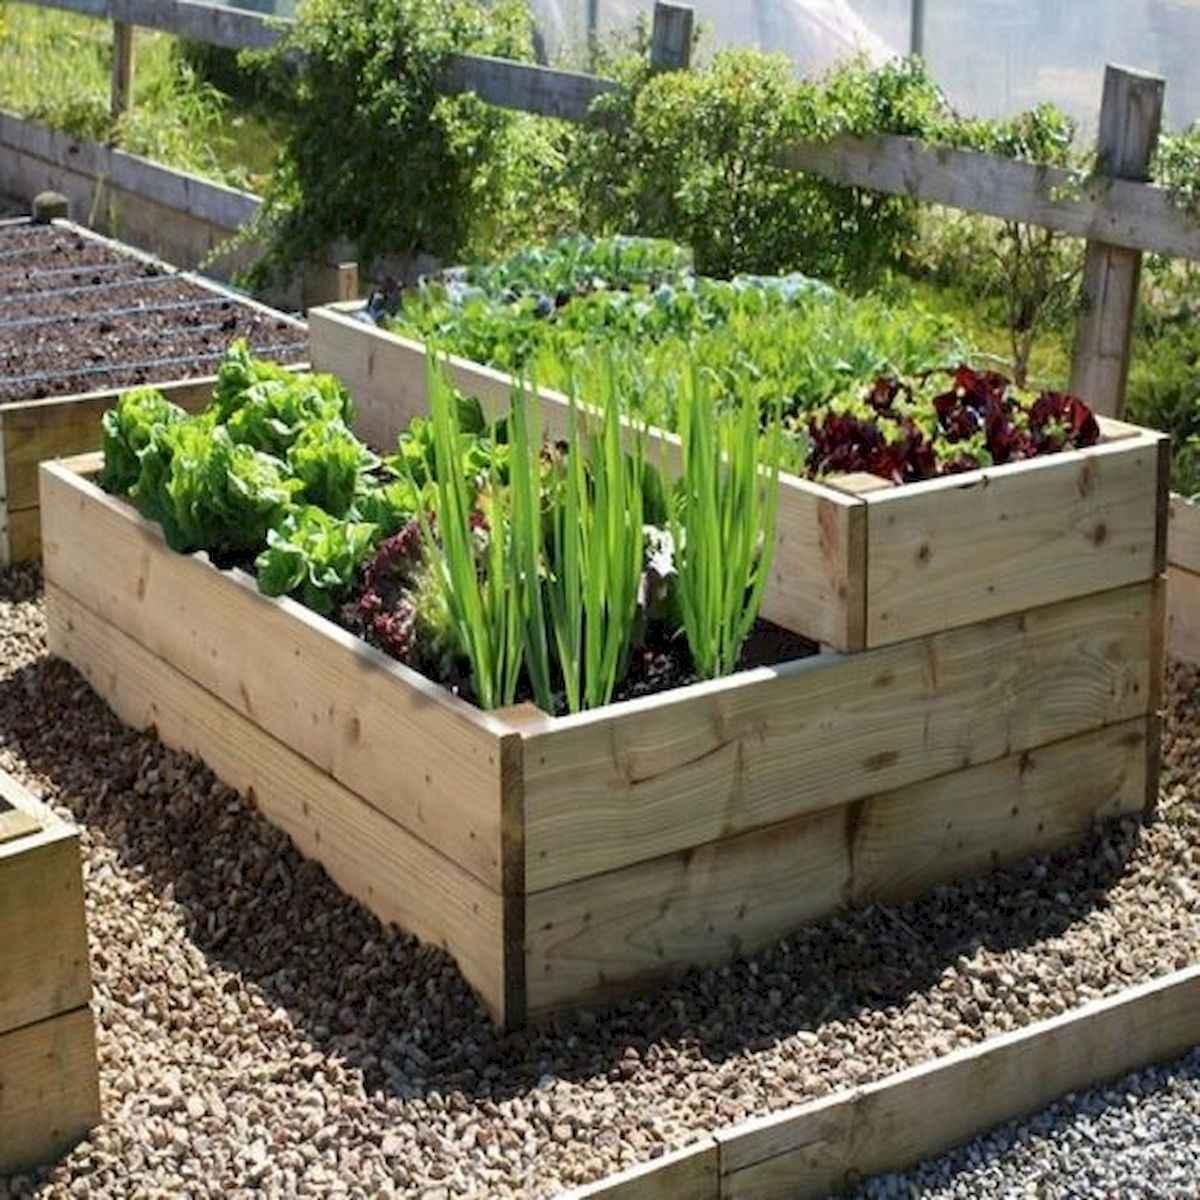 55 Favorite Garden Boxes Raised Design Ideas (17)